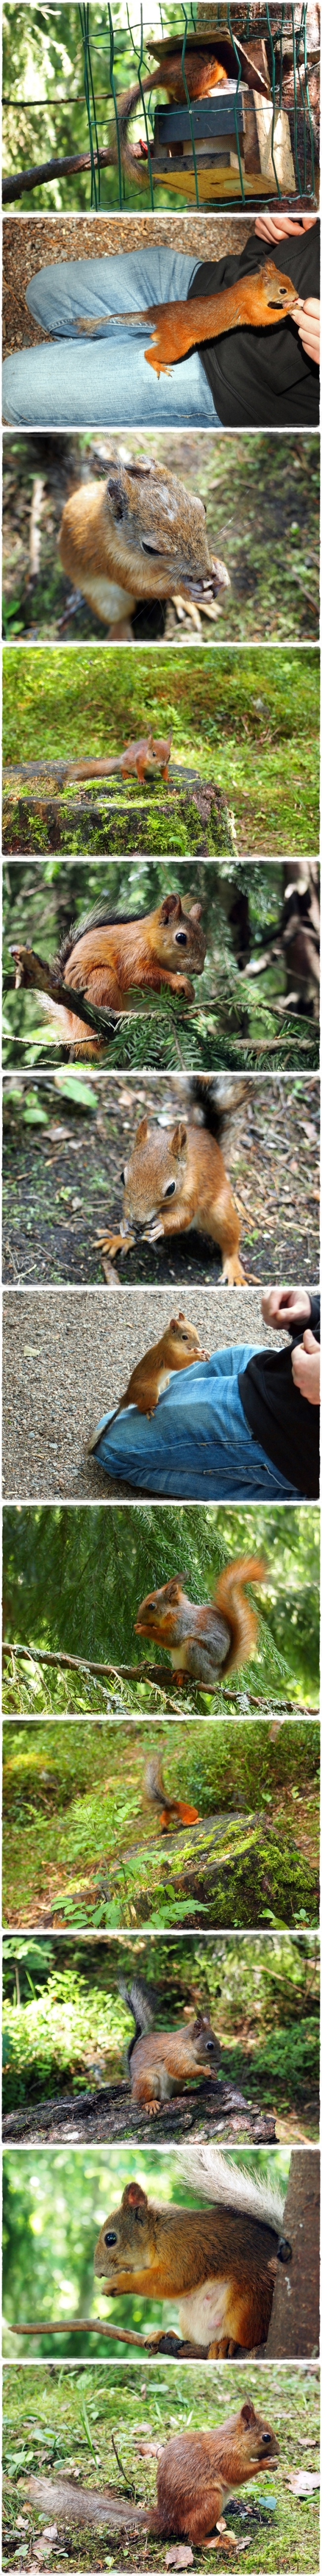 Eichhörnchenspam